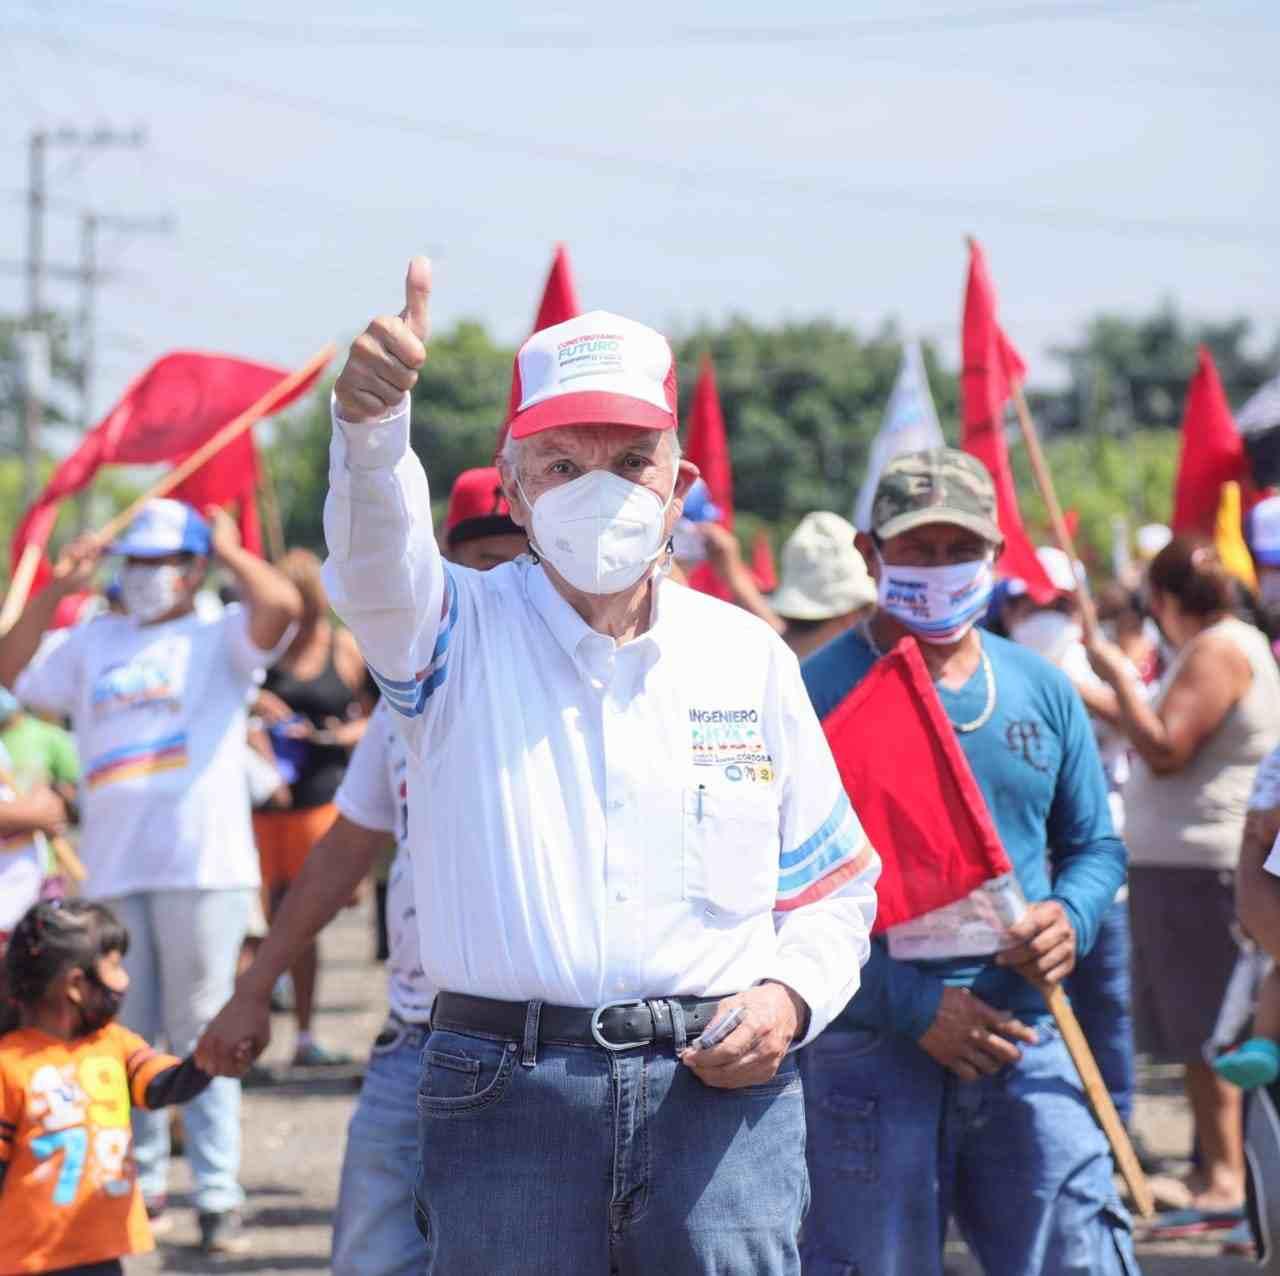 RESPALDO A EMPRESAS CORDOBESAS PARA GENERAR EMPLEOS; GUILLERMO RIVAS